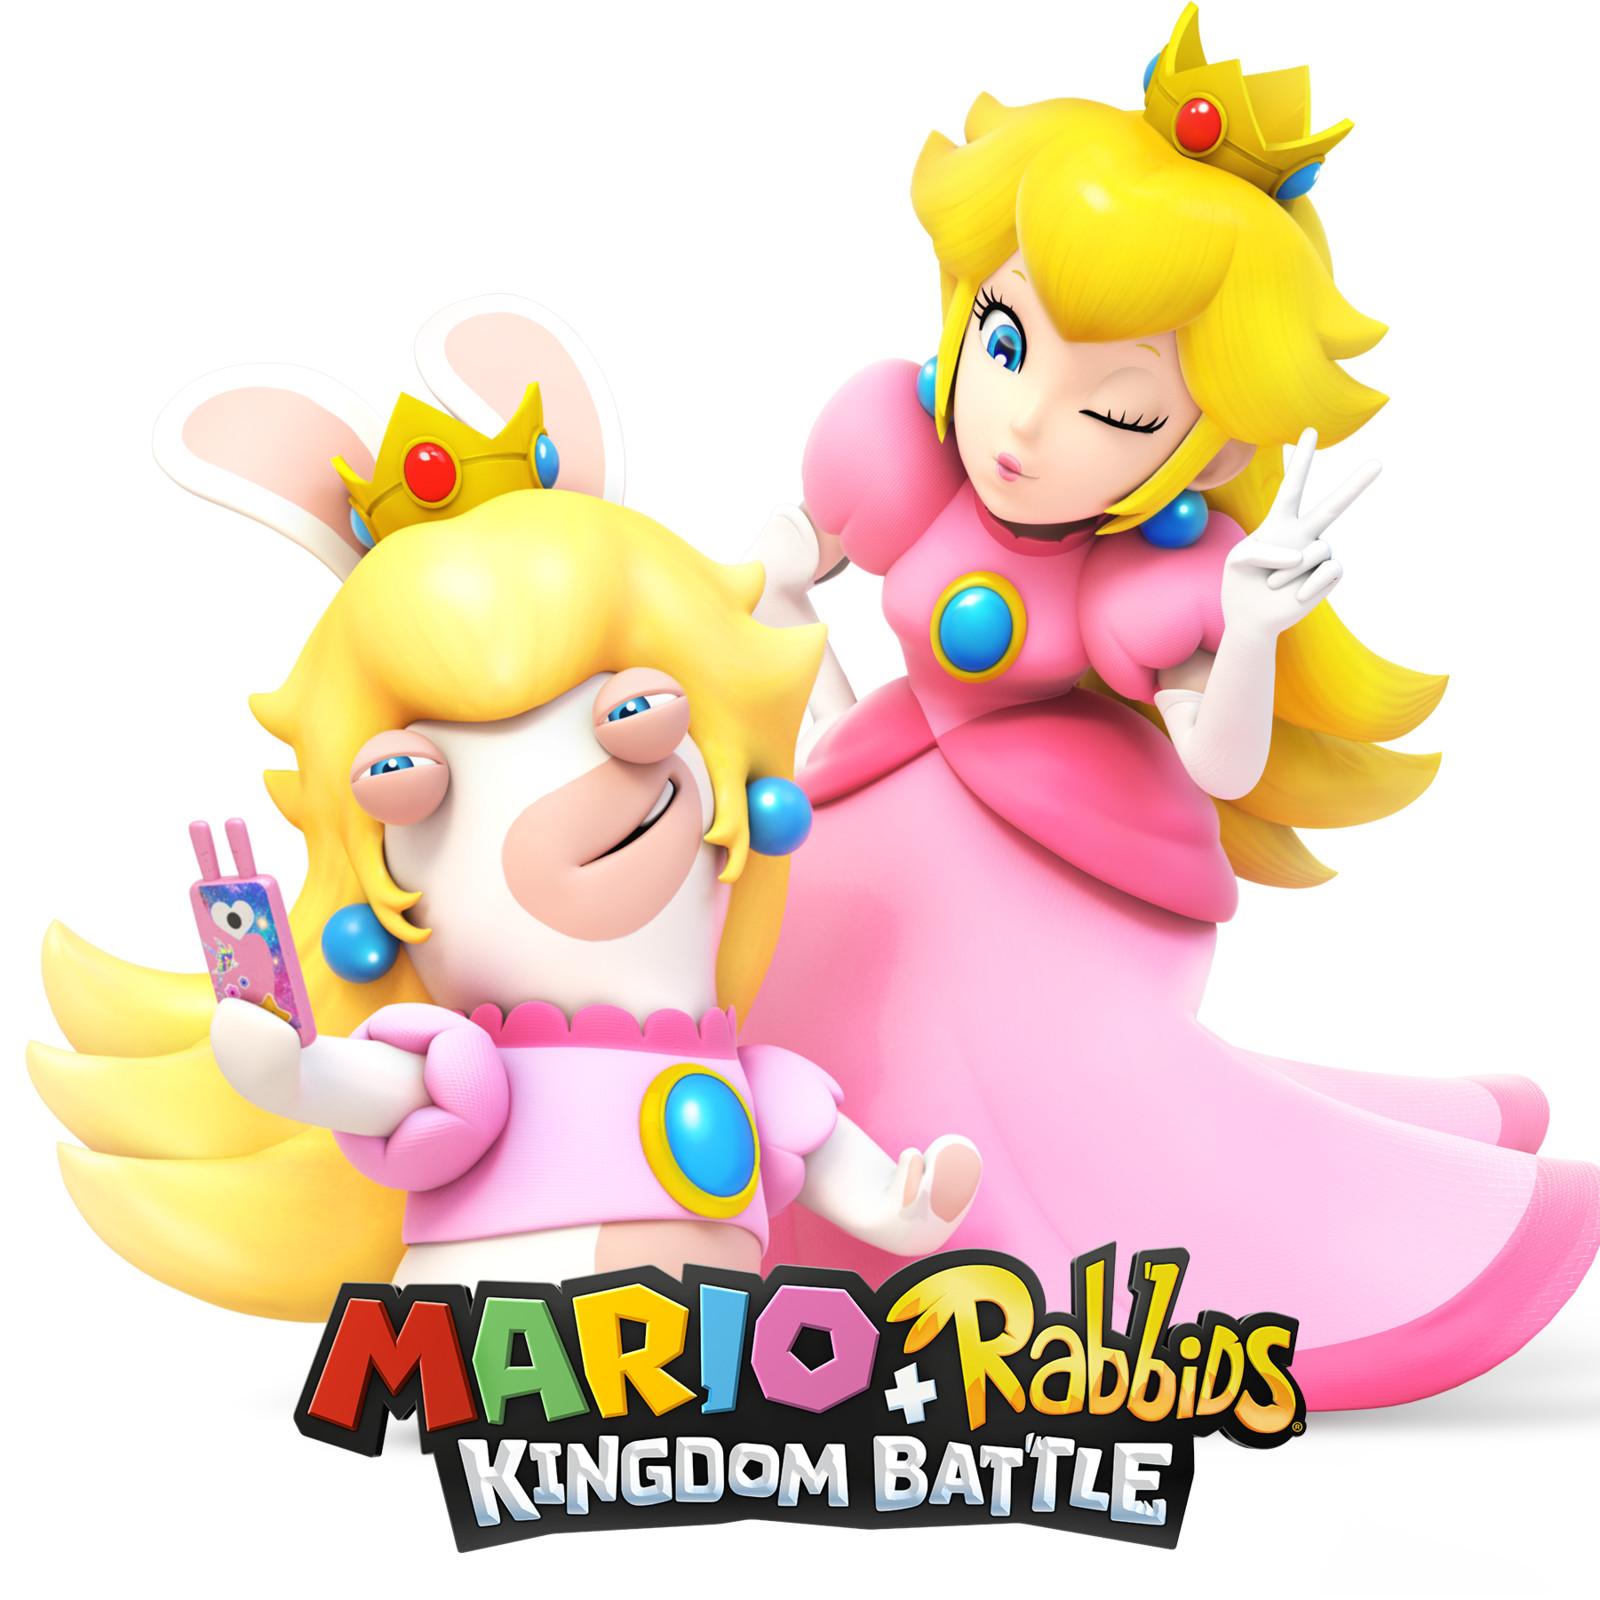 MARIO+RABBIDS KINGDOM BATTLE Characters